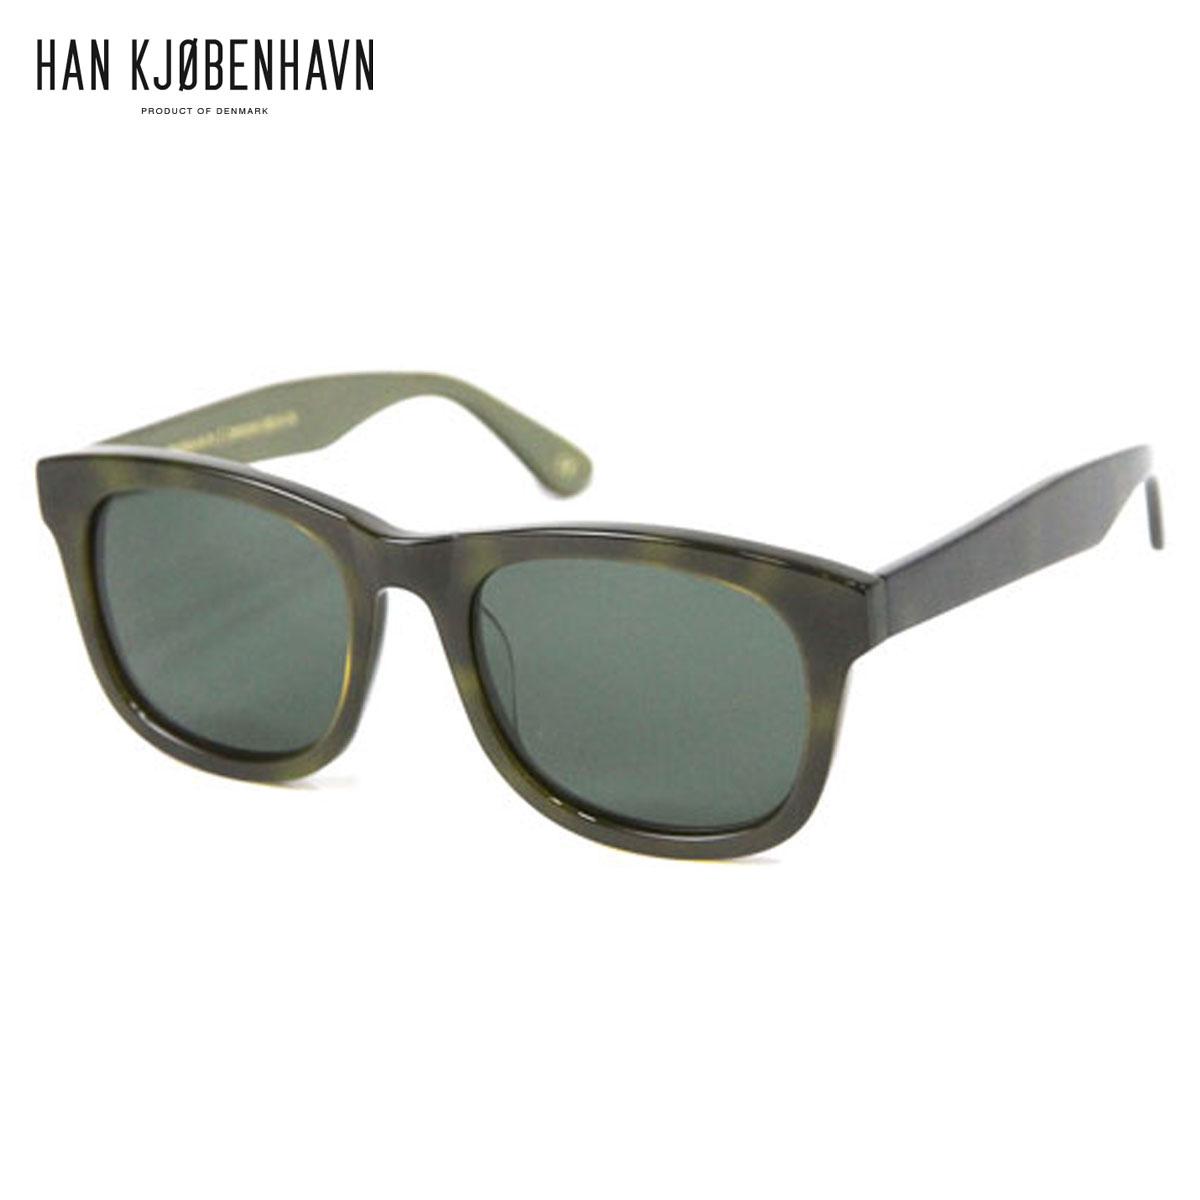 d1d3b31548e Rakuten Ichiba shop MIXON  Han HAN KJOBENHAVN sunglasses WOLFGANG ...